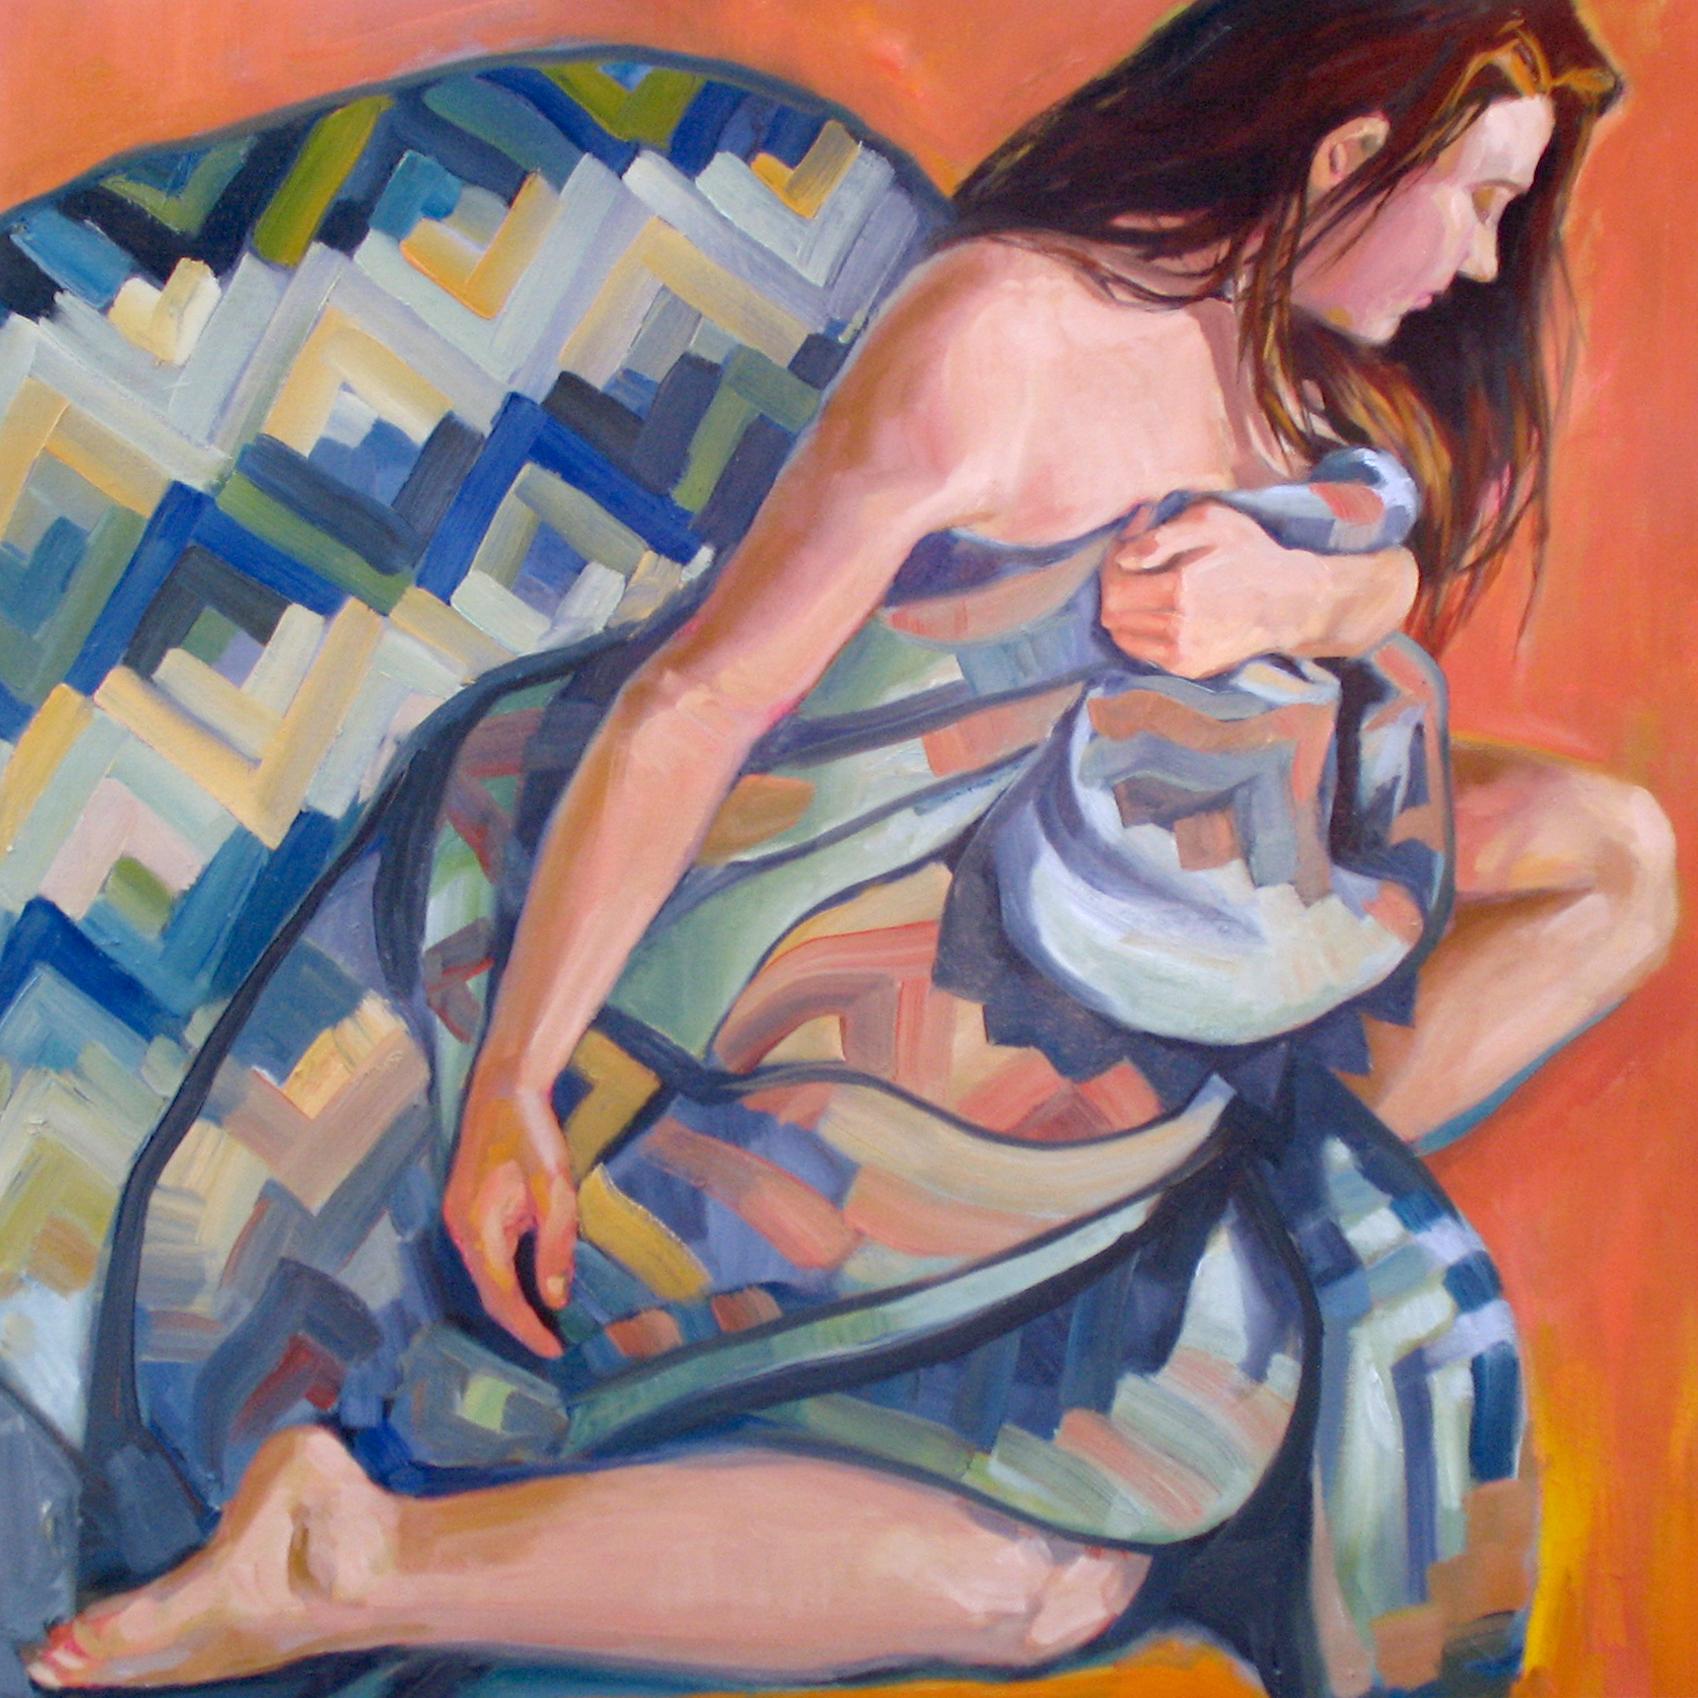 Girl in a Blanket